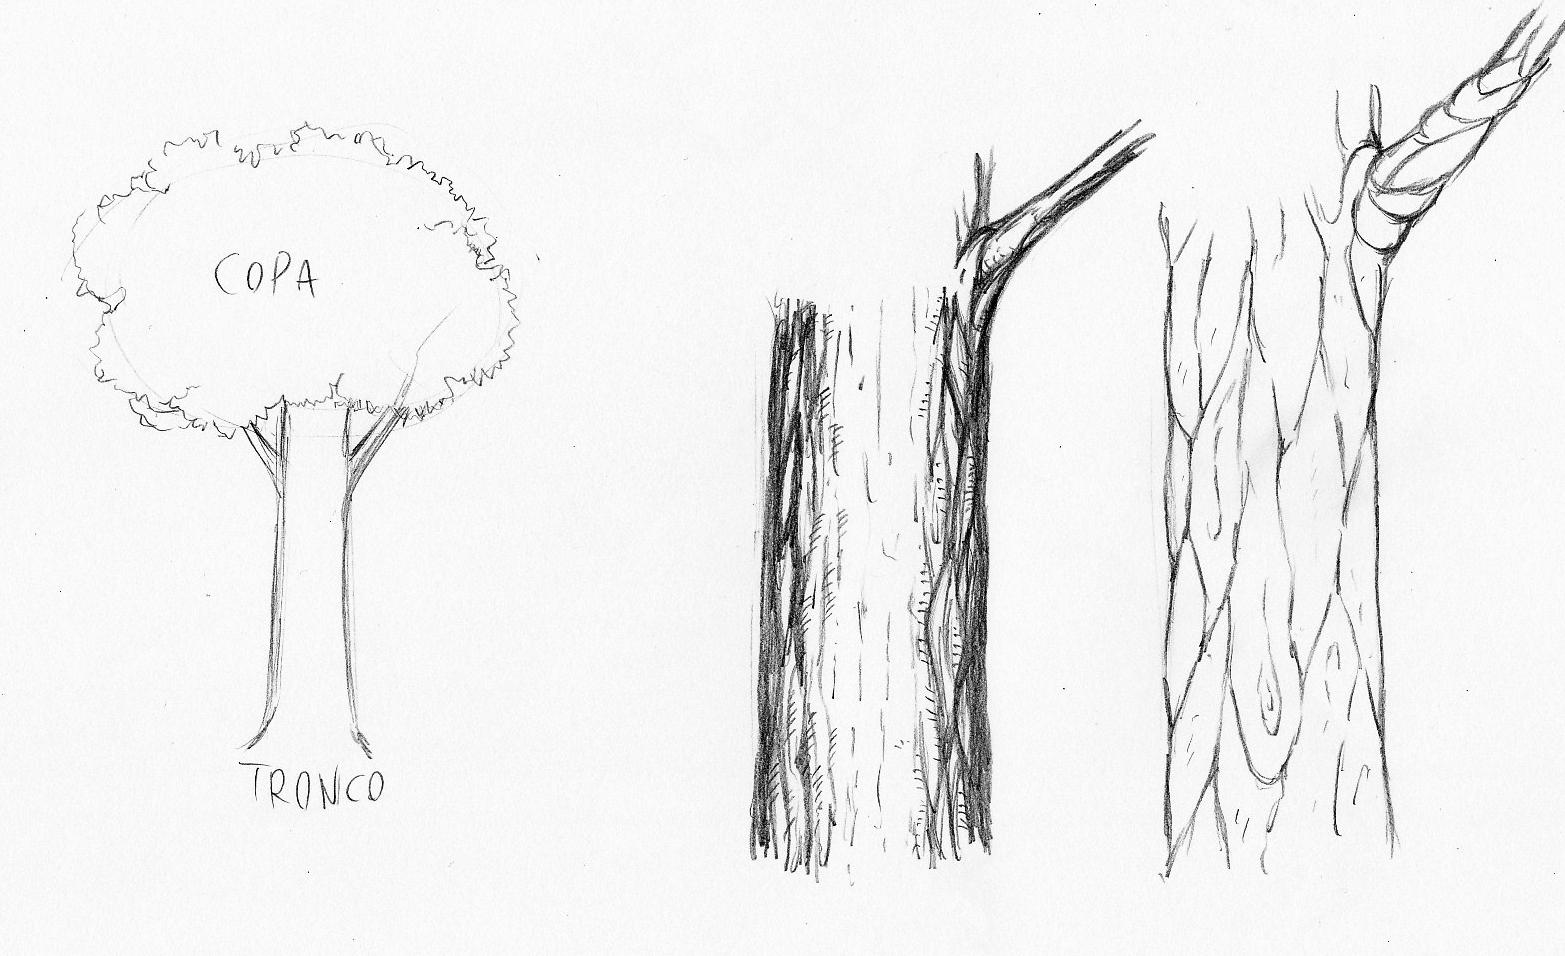 Imagens De Arvore Para Imprimir: Desenhos De Arvores Para Imprimir